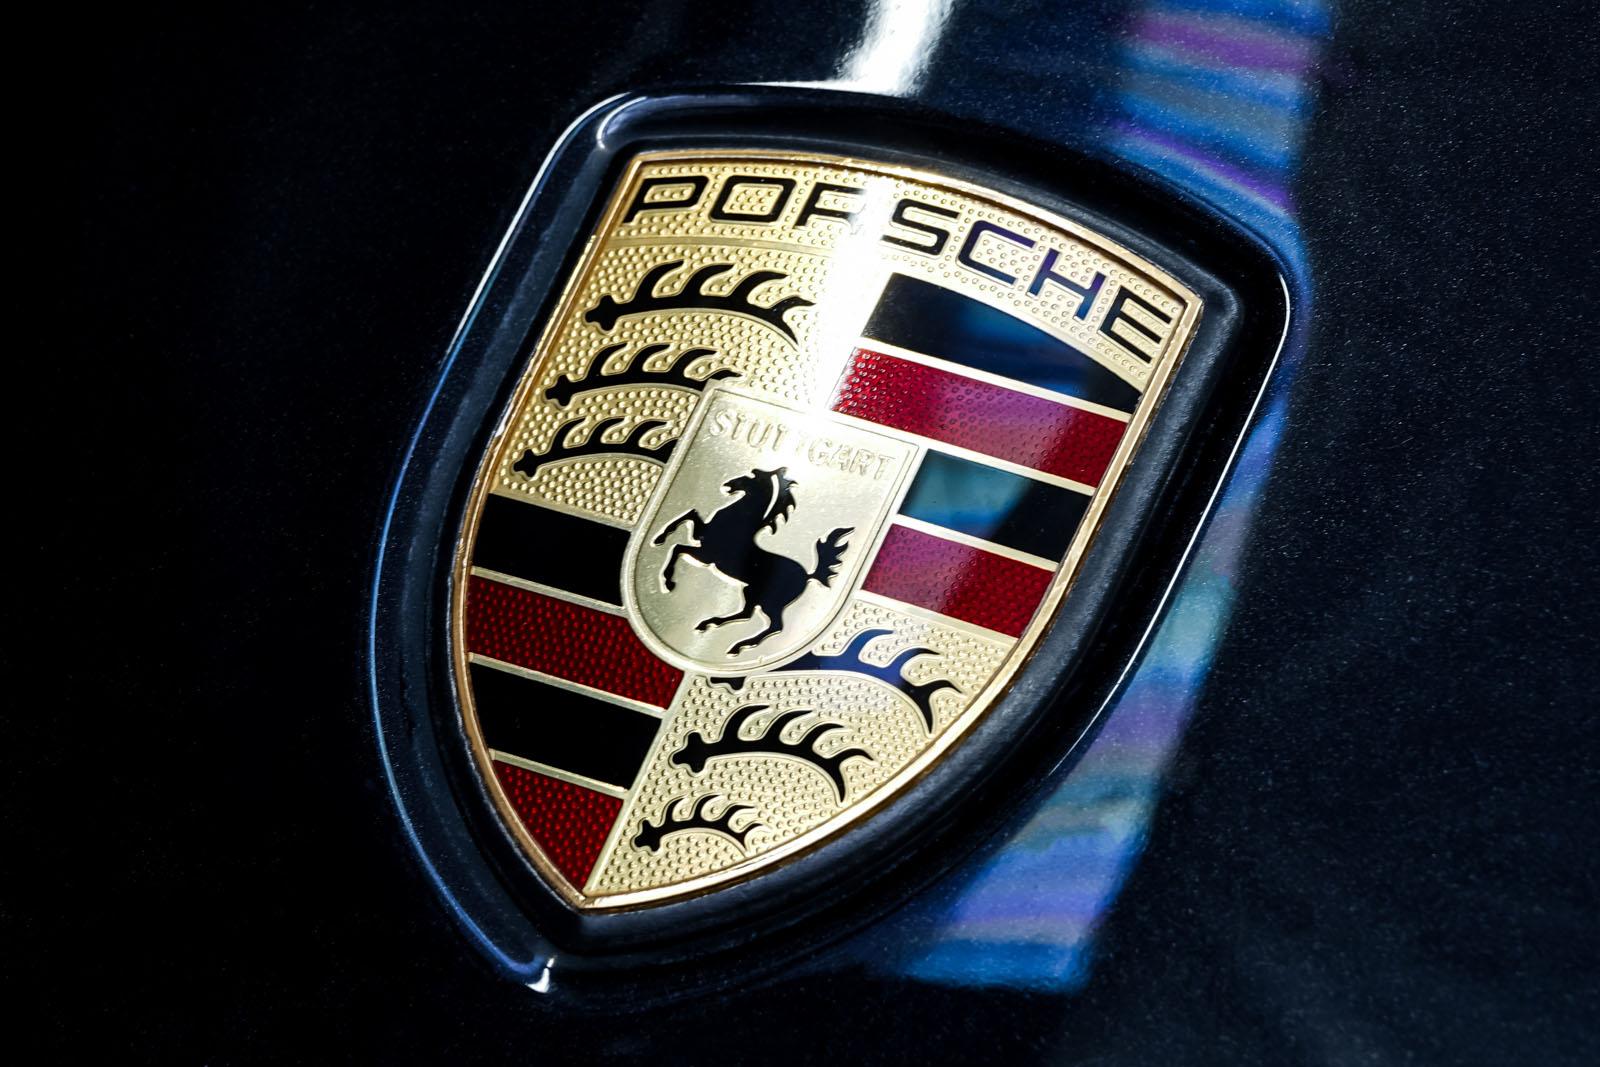 11Porsche_Panamera4_Schwarz_Schwarz_POR-1033_12_w